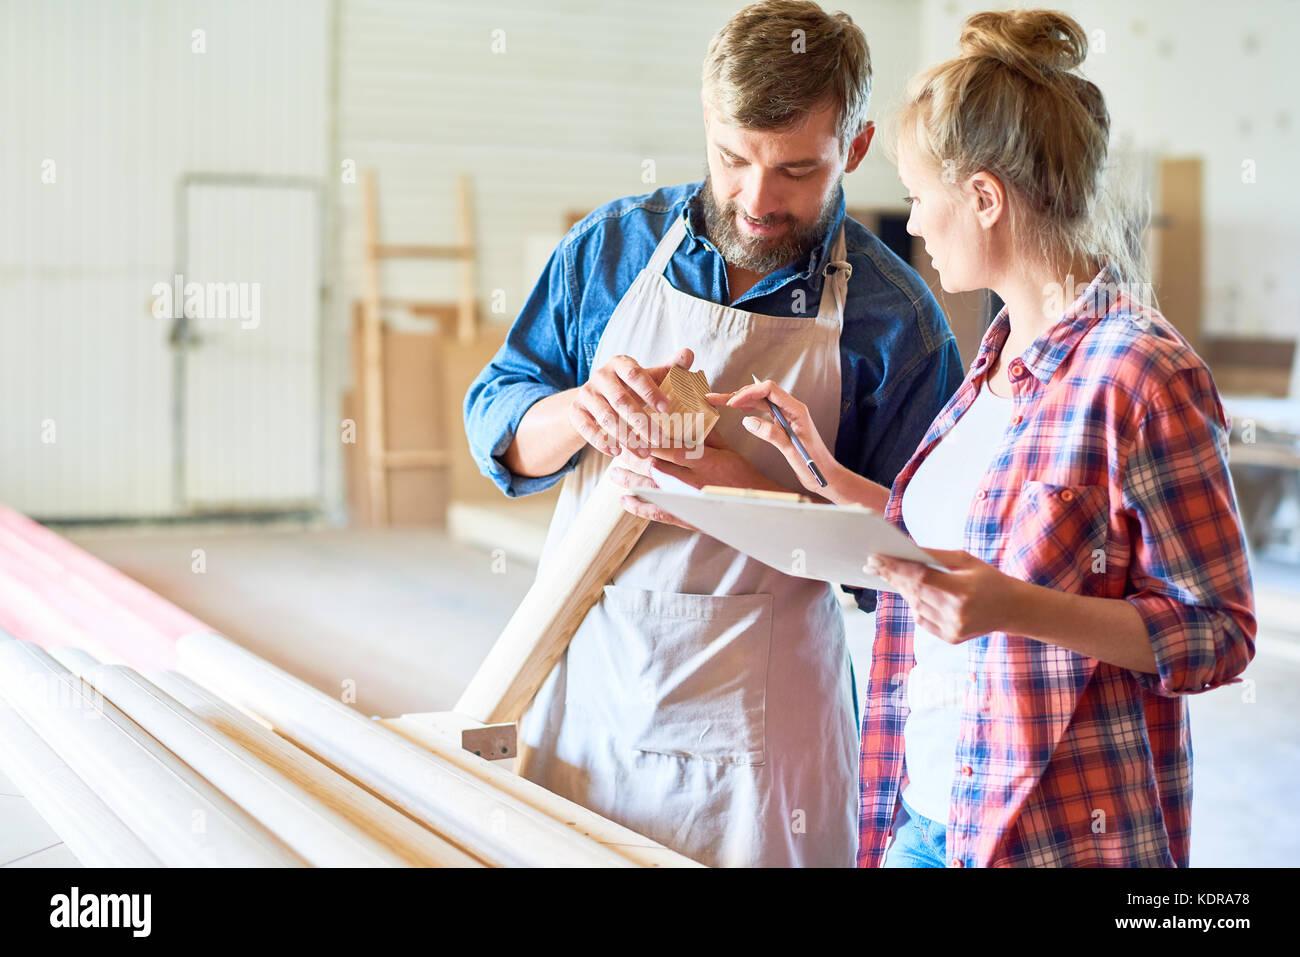 Modern Carpenters Choosing Wood in Joinery - Stock Image